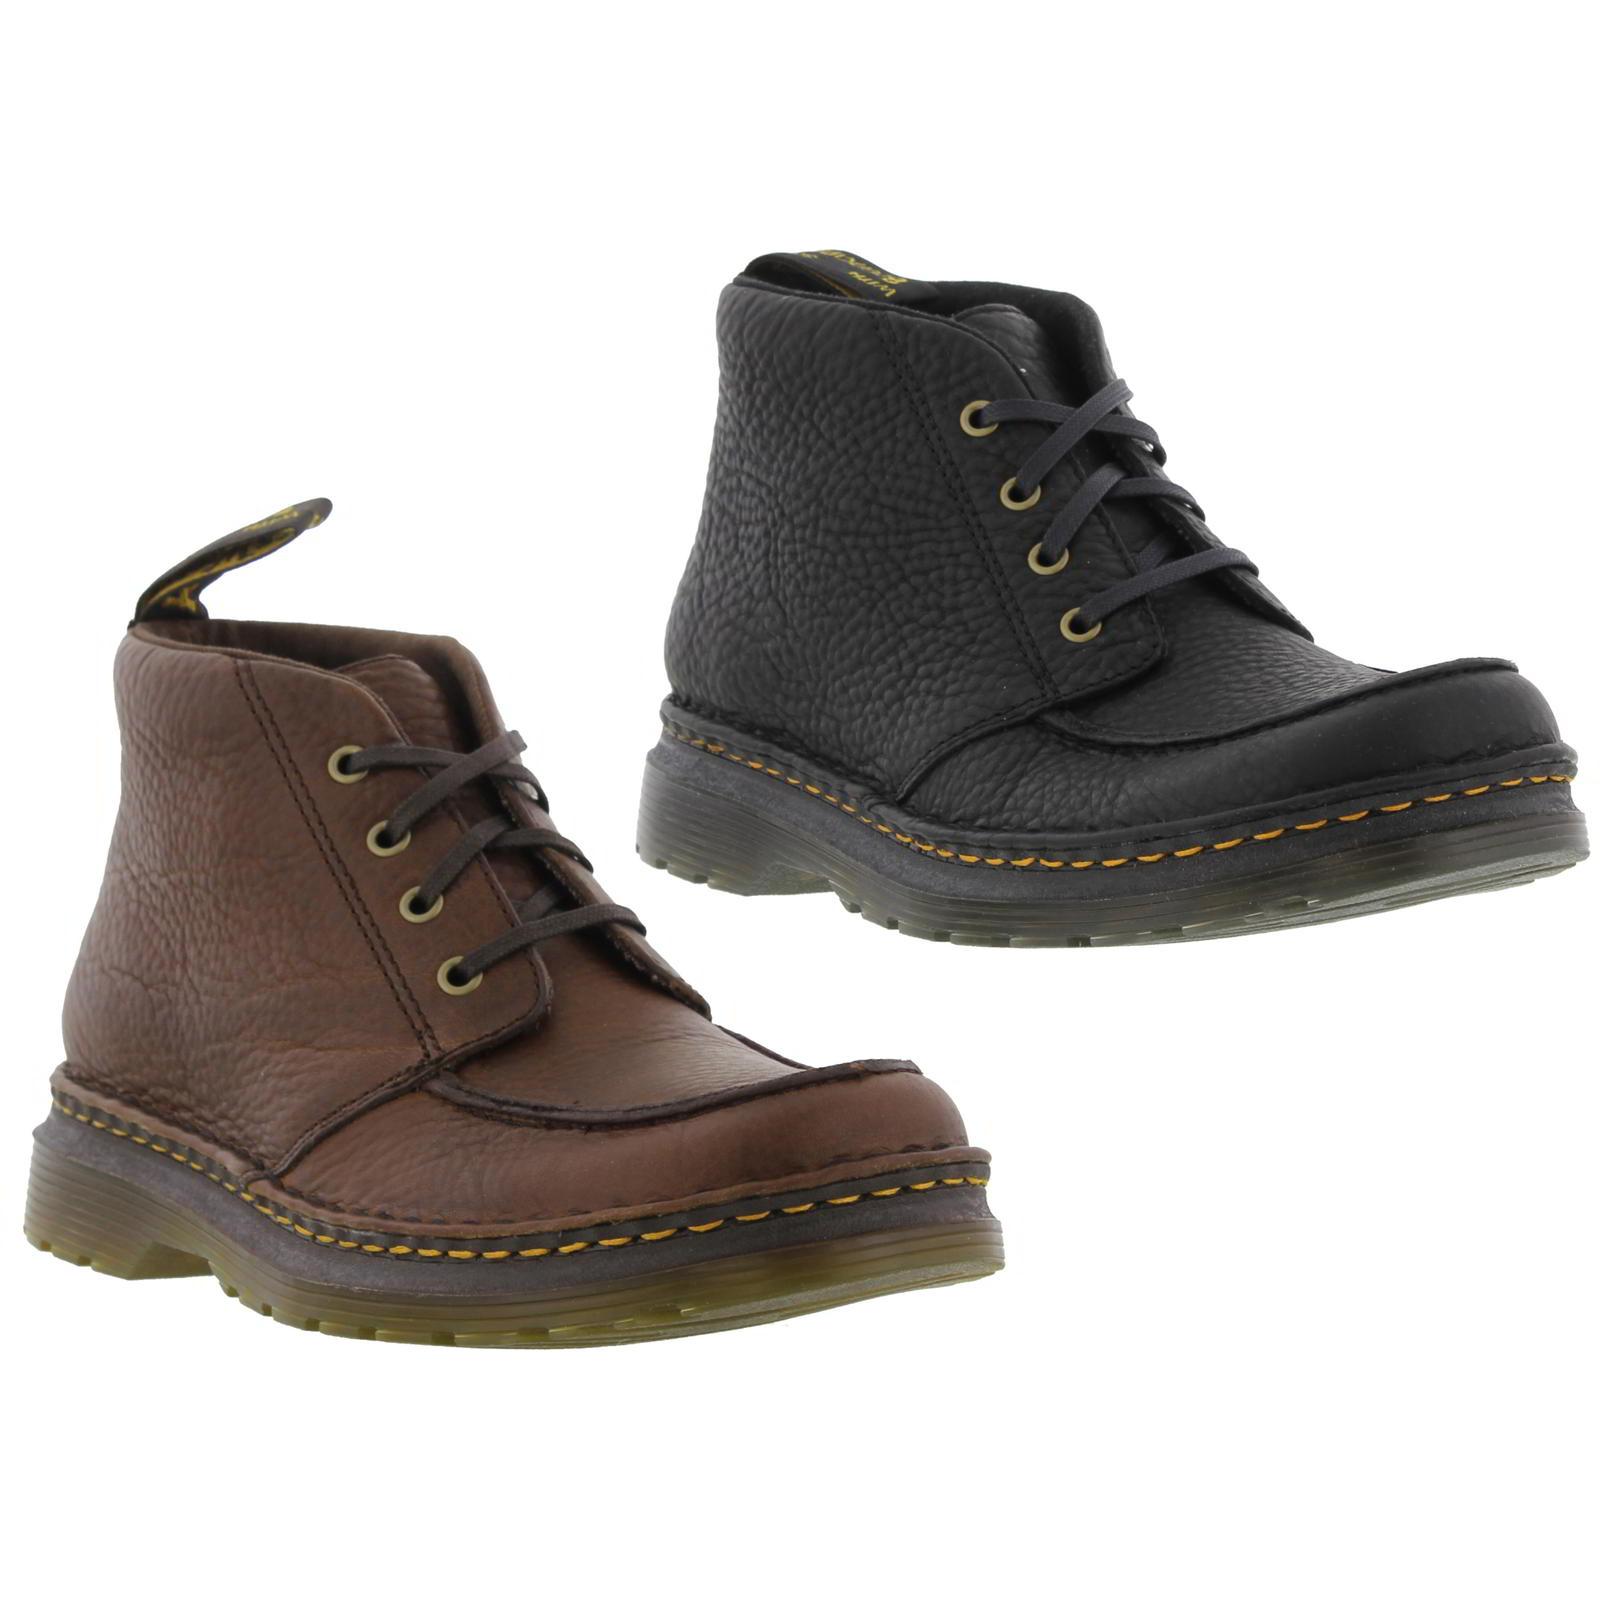 99f0bcb2 Dr Martens Austin Mens Moc Toe Black Brown Leather Chukka Boots Size ...